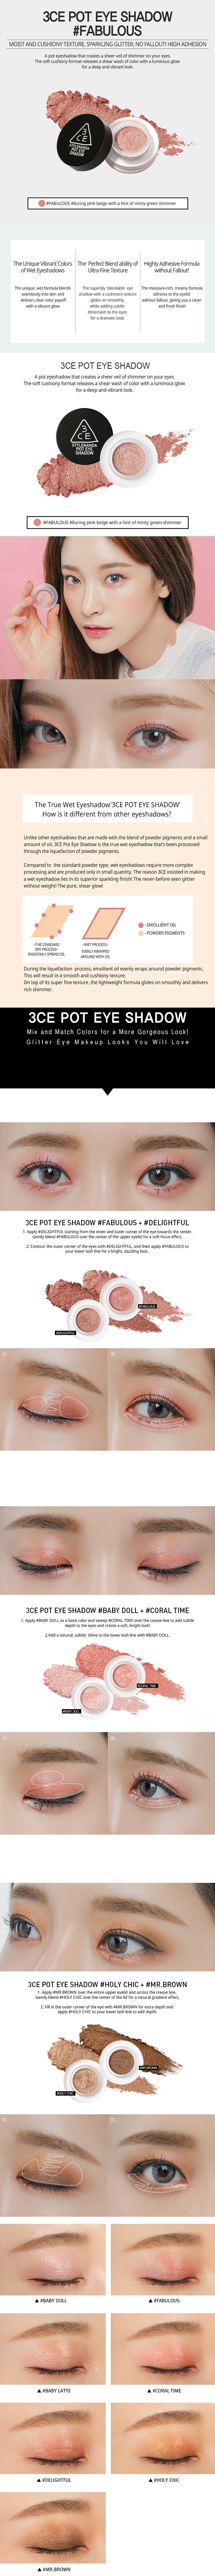 Phấn Mắt Nhũ 3CE Pot Eye Shadow - 2